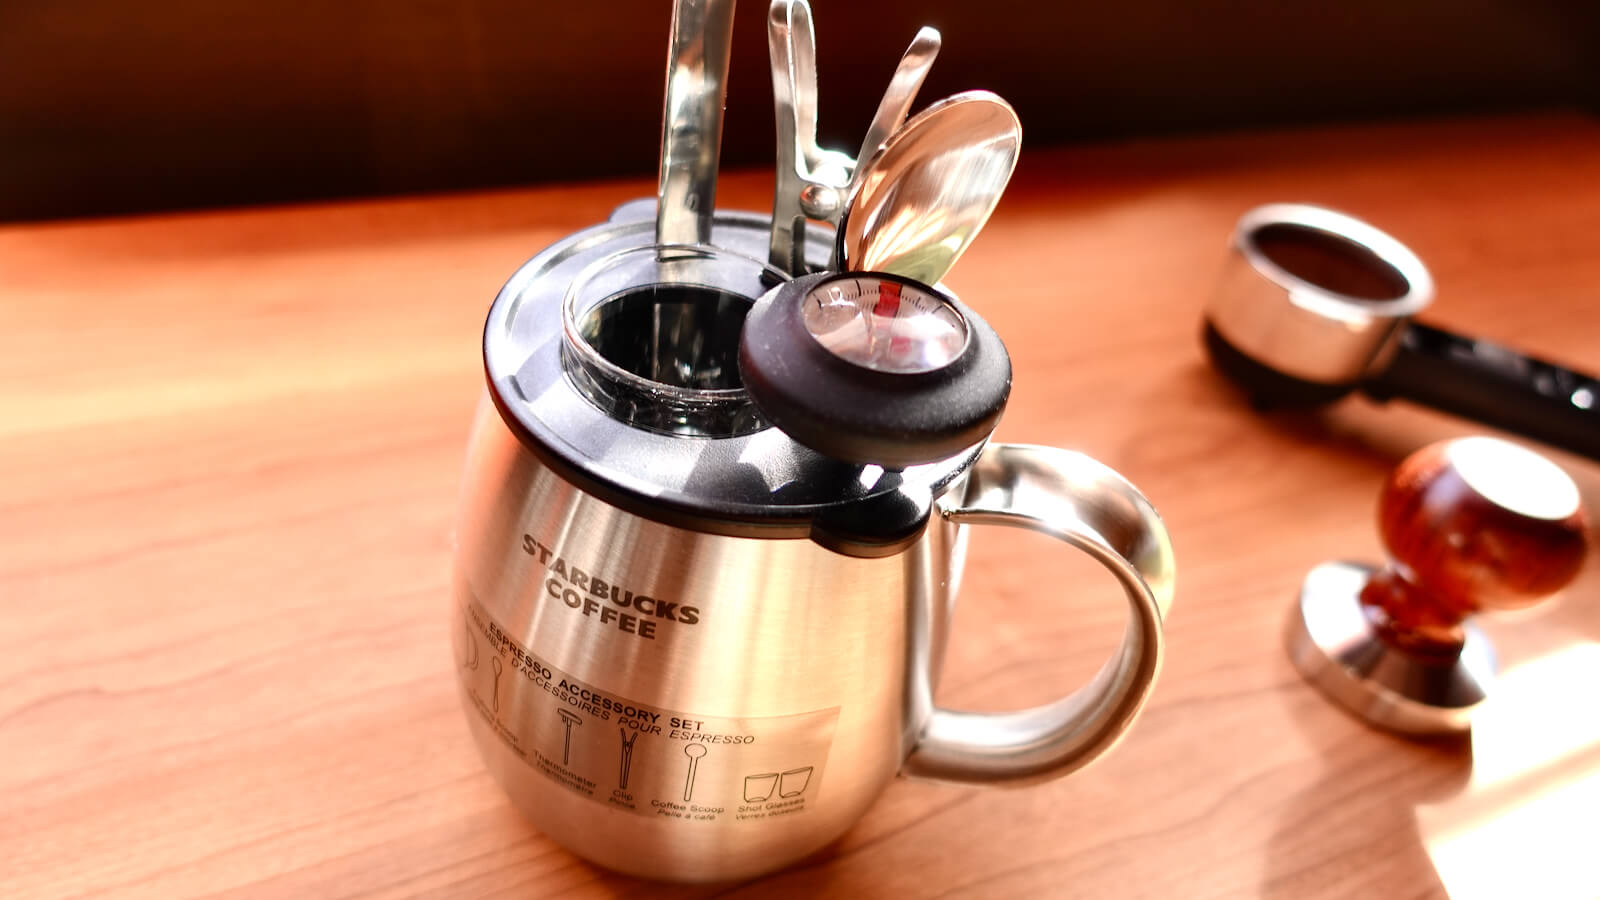 Starbucks Espresso Kit 7-piece set